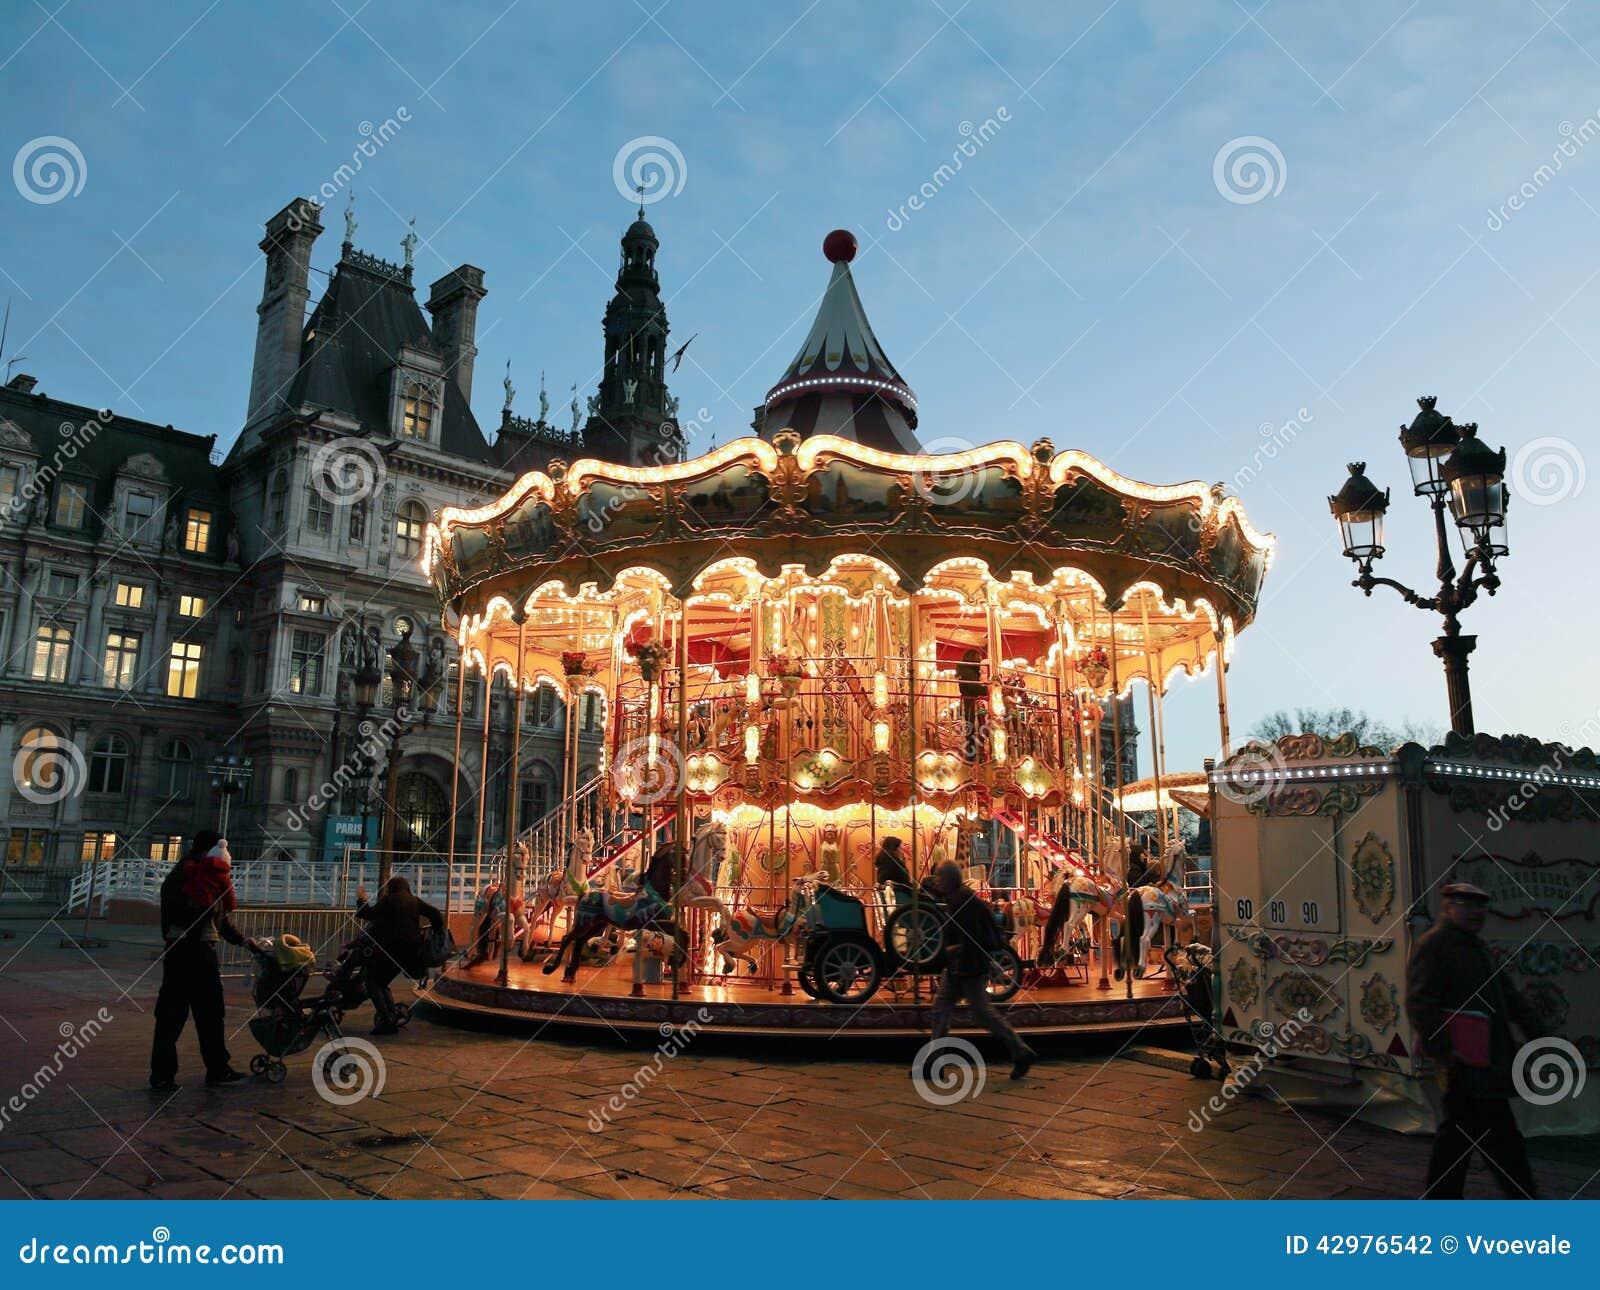 Carousel At Place De Hotel De Ville In Paris Editorial